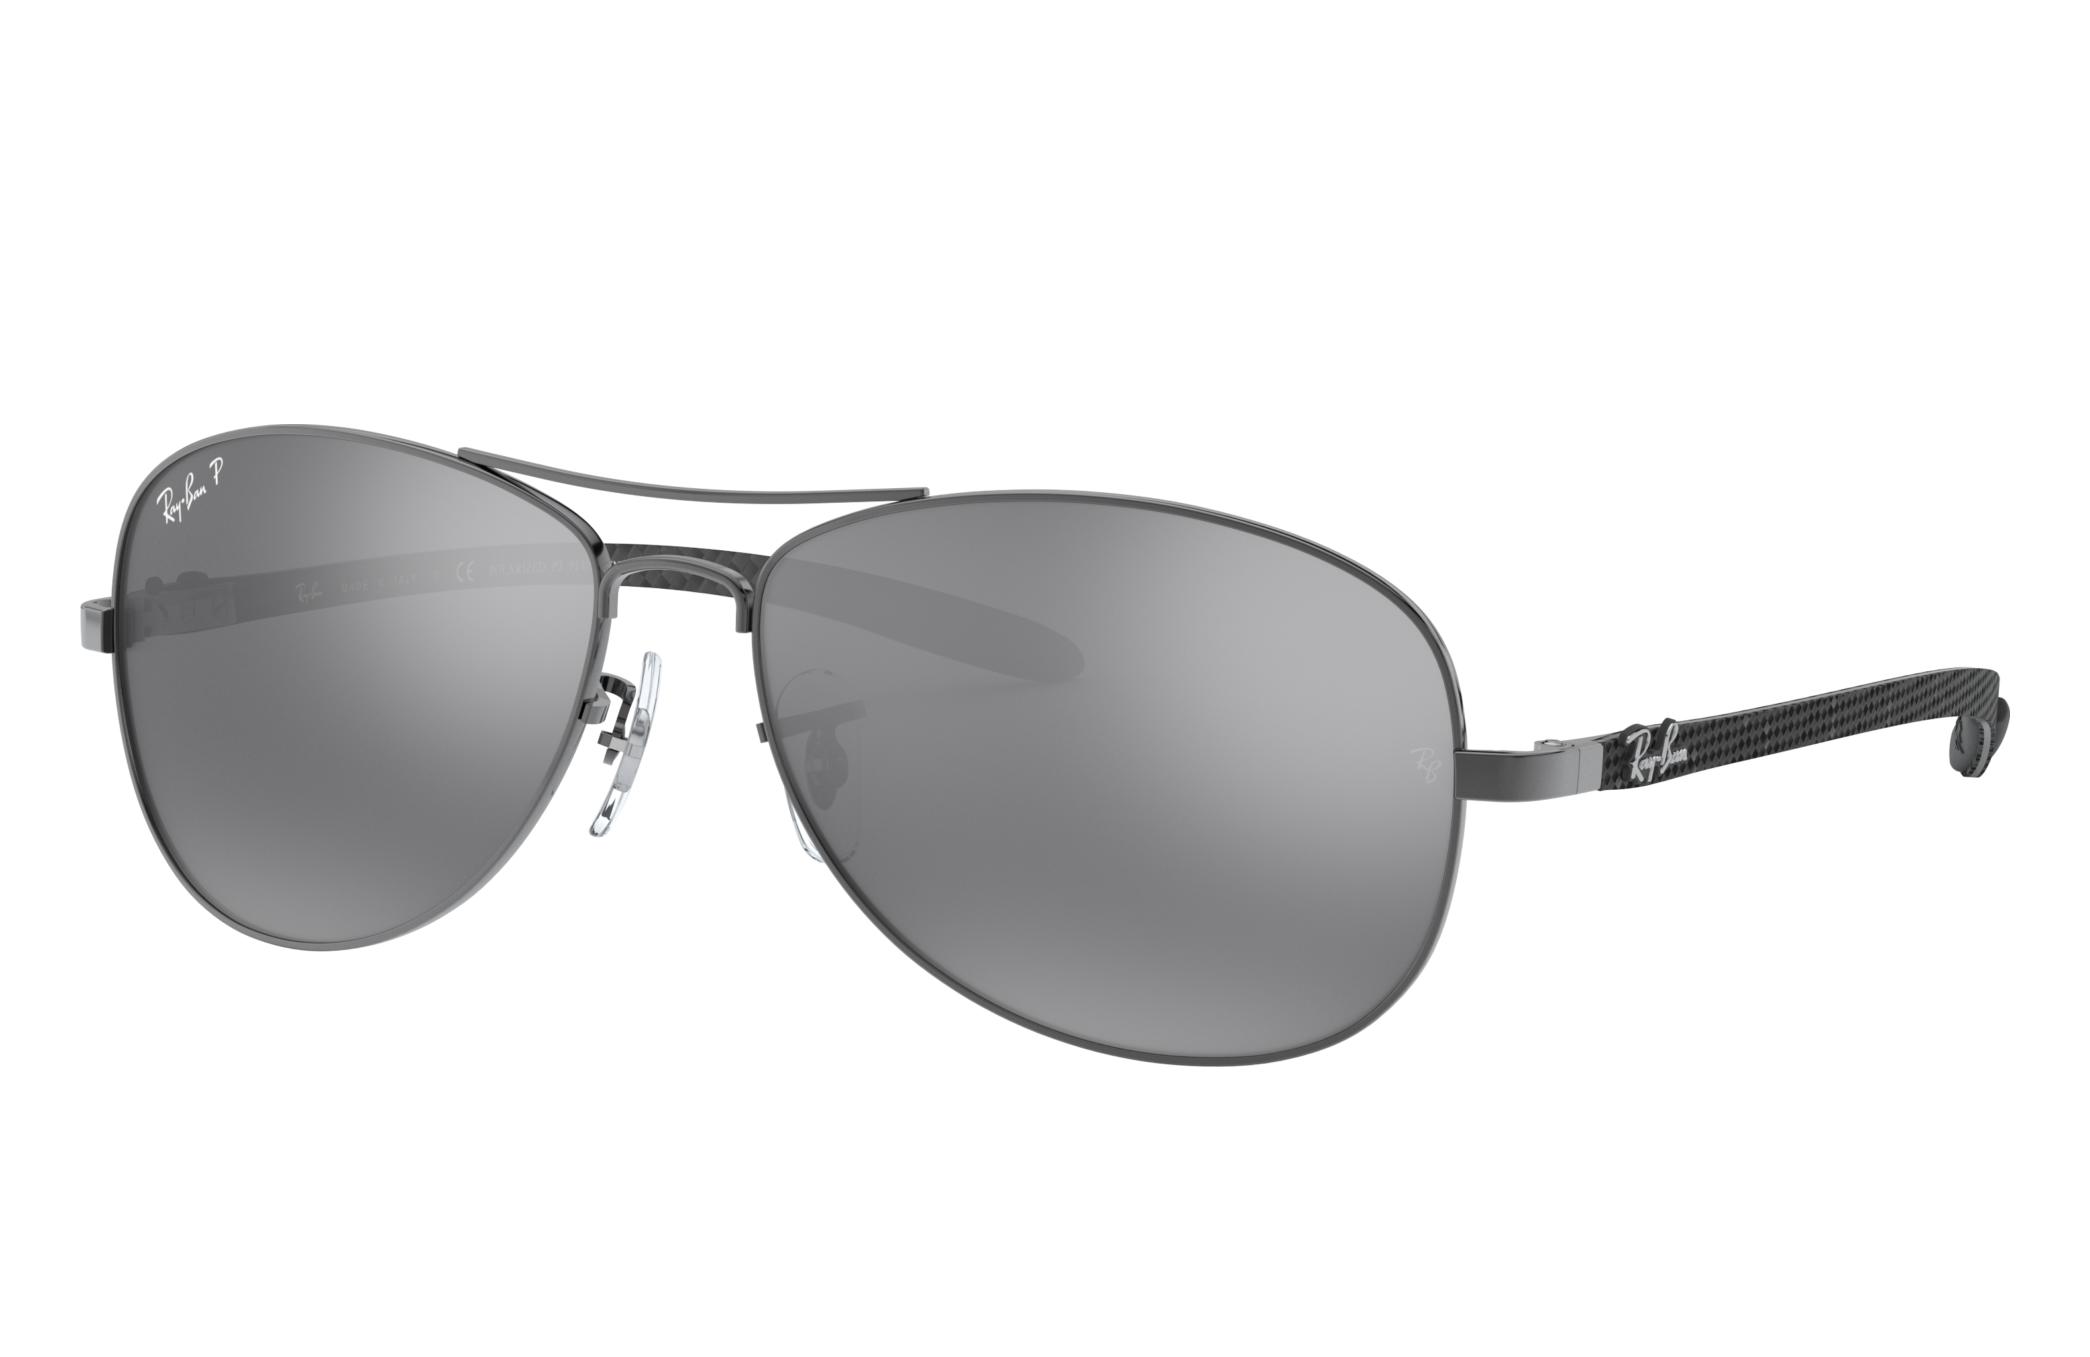 Ray-Ban Rb8301 Grey, Polarized Gray Lenses - RB8301